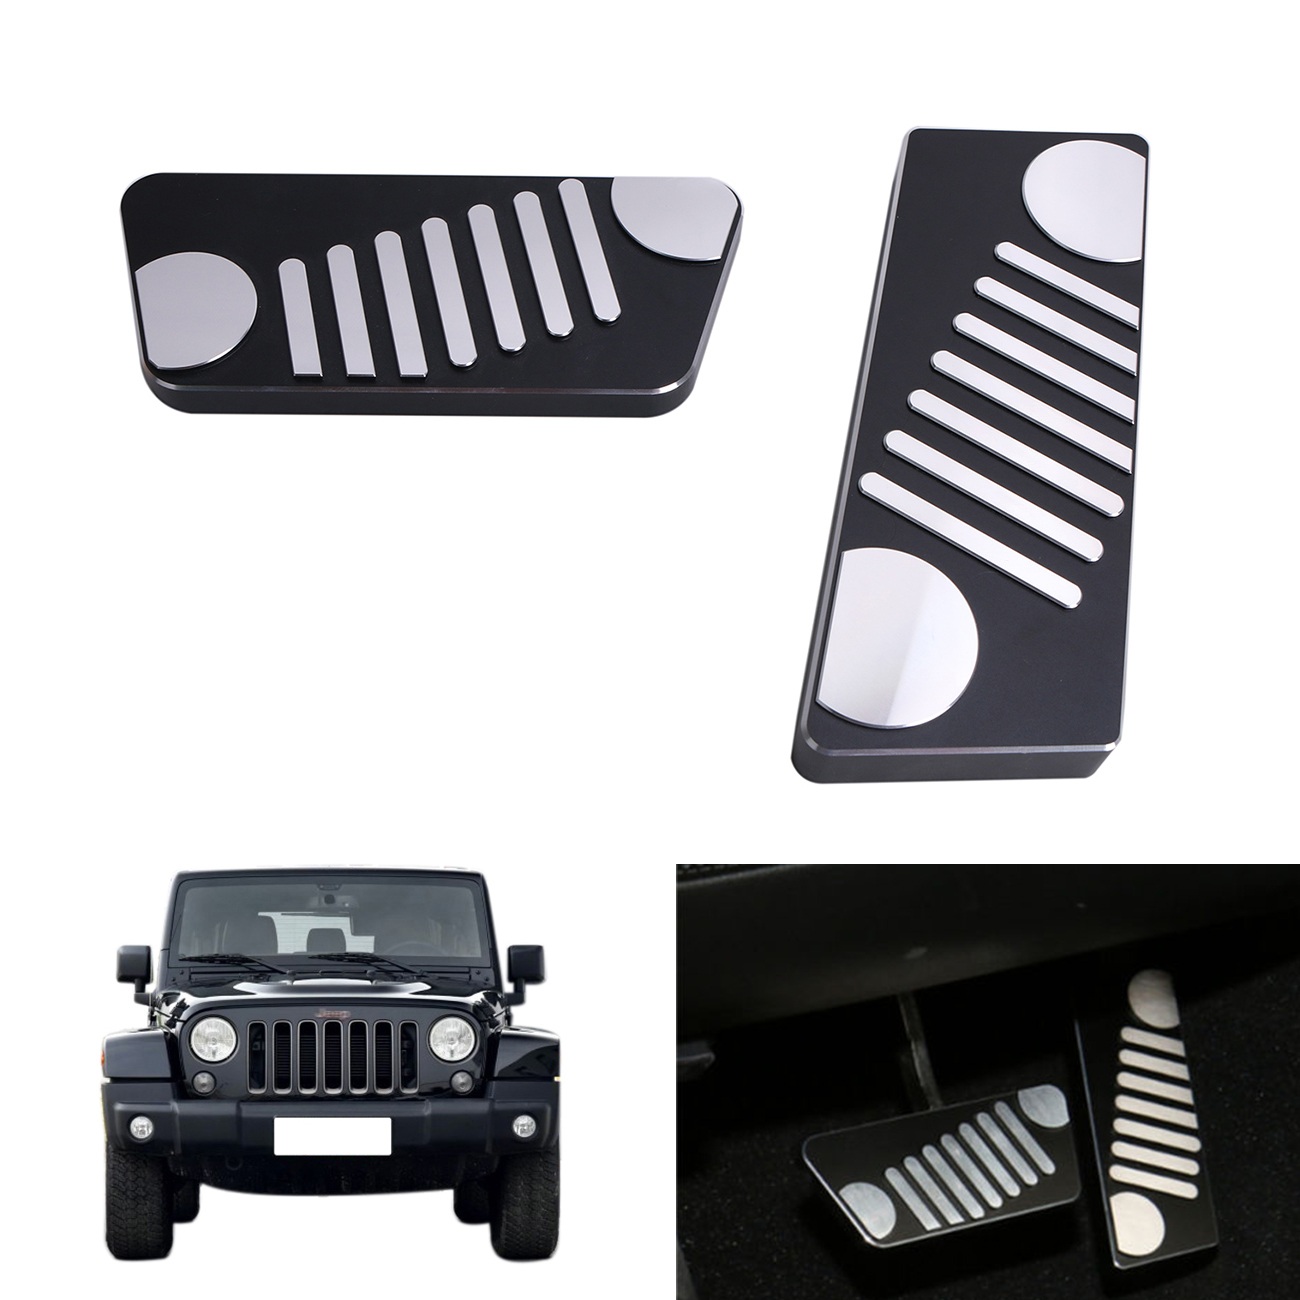 medium resolution of black aluminum alloy accelerator gas brake pedal kit for jeep wrangler jk rubicon sahara sport 2009 2016 left hand drive ce037